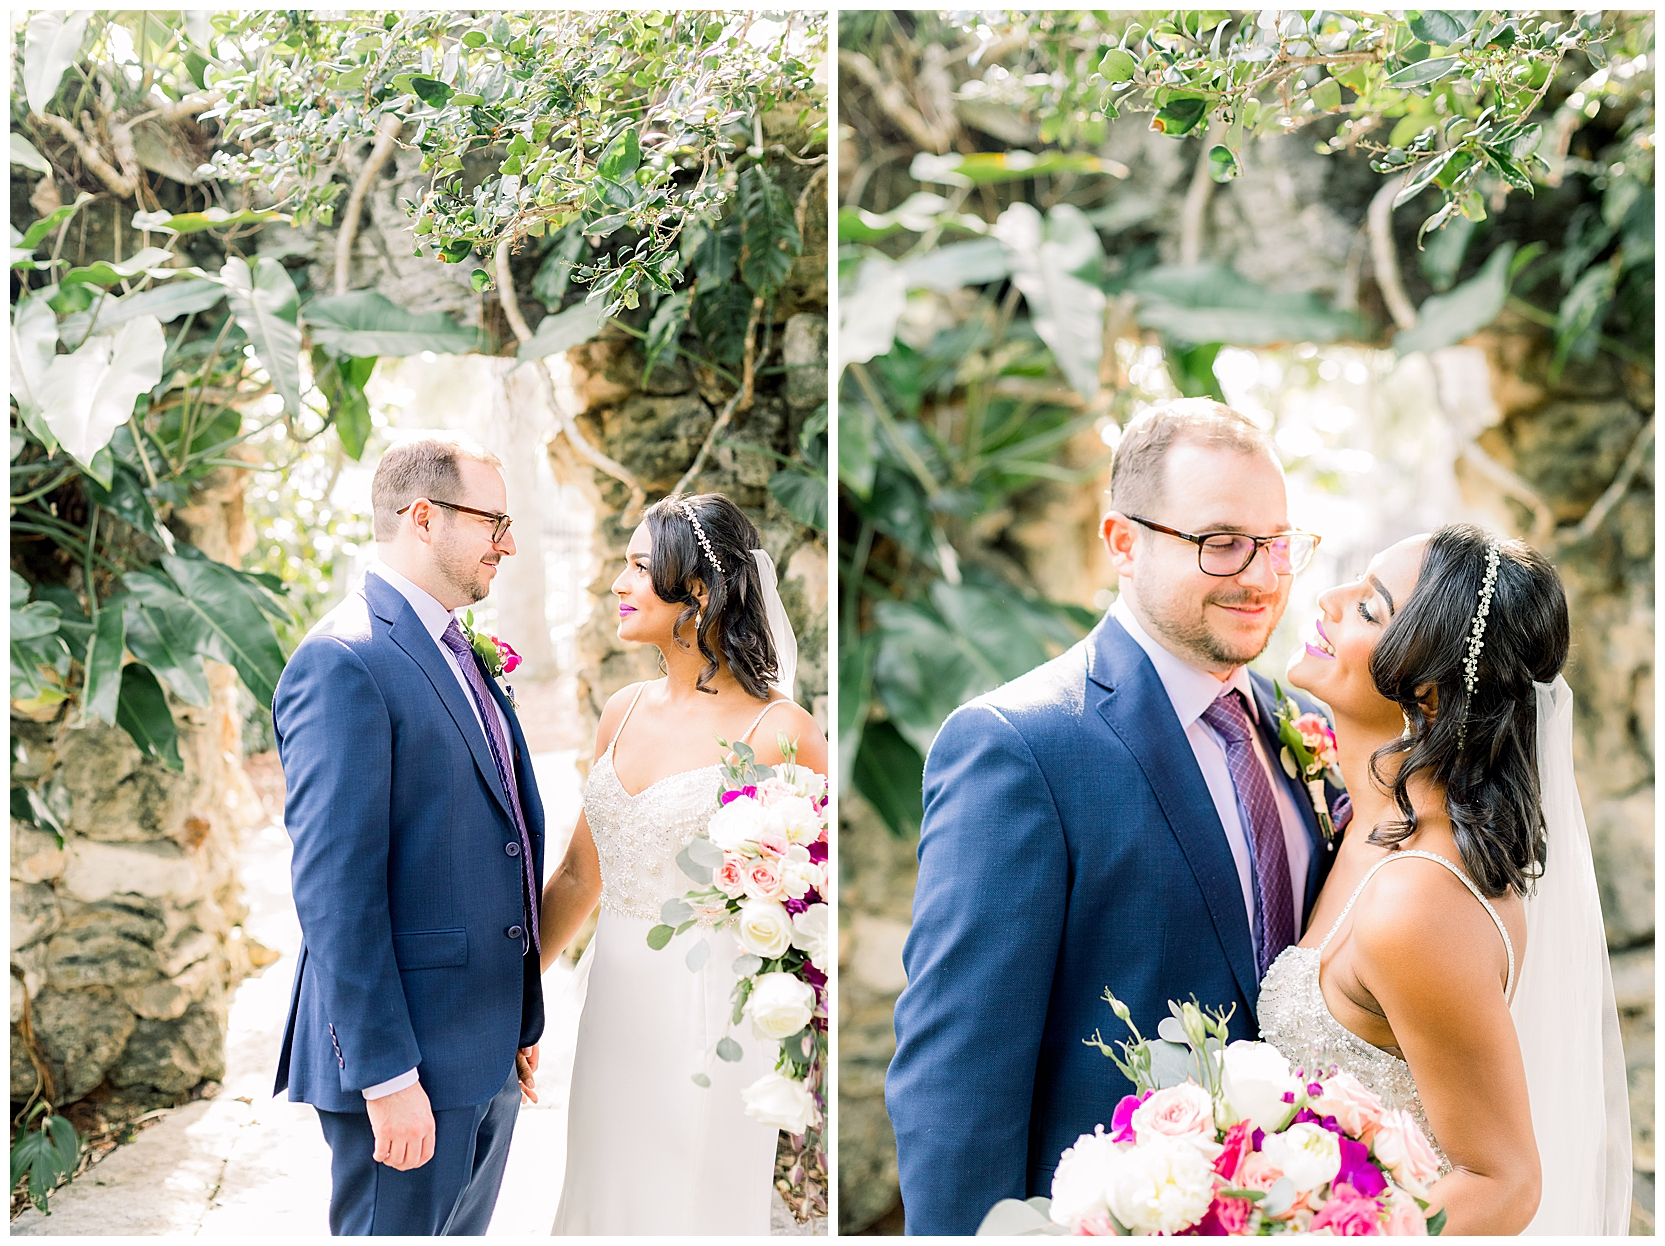 jessicafredericks_lakeland_tampa_wedding_purple_crazy hour_0032.jpg